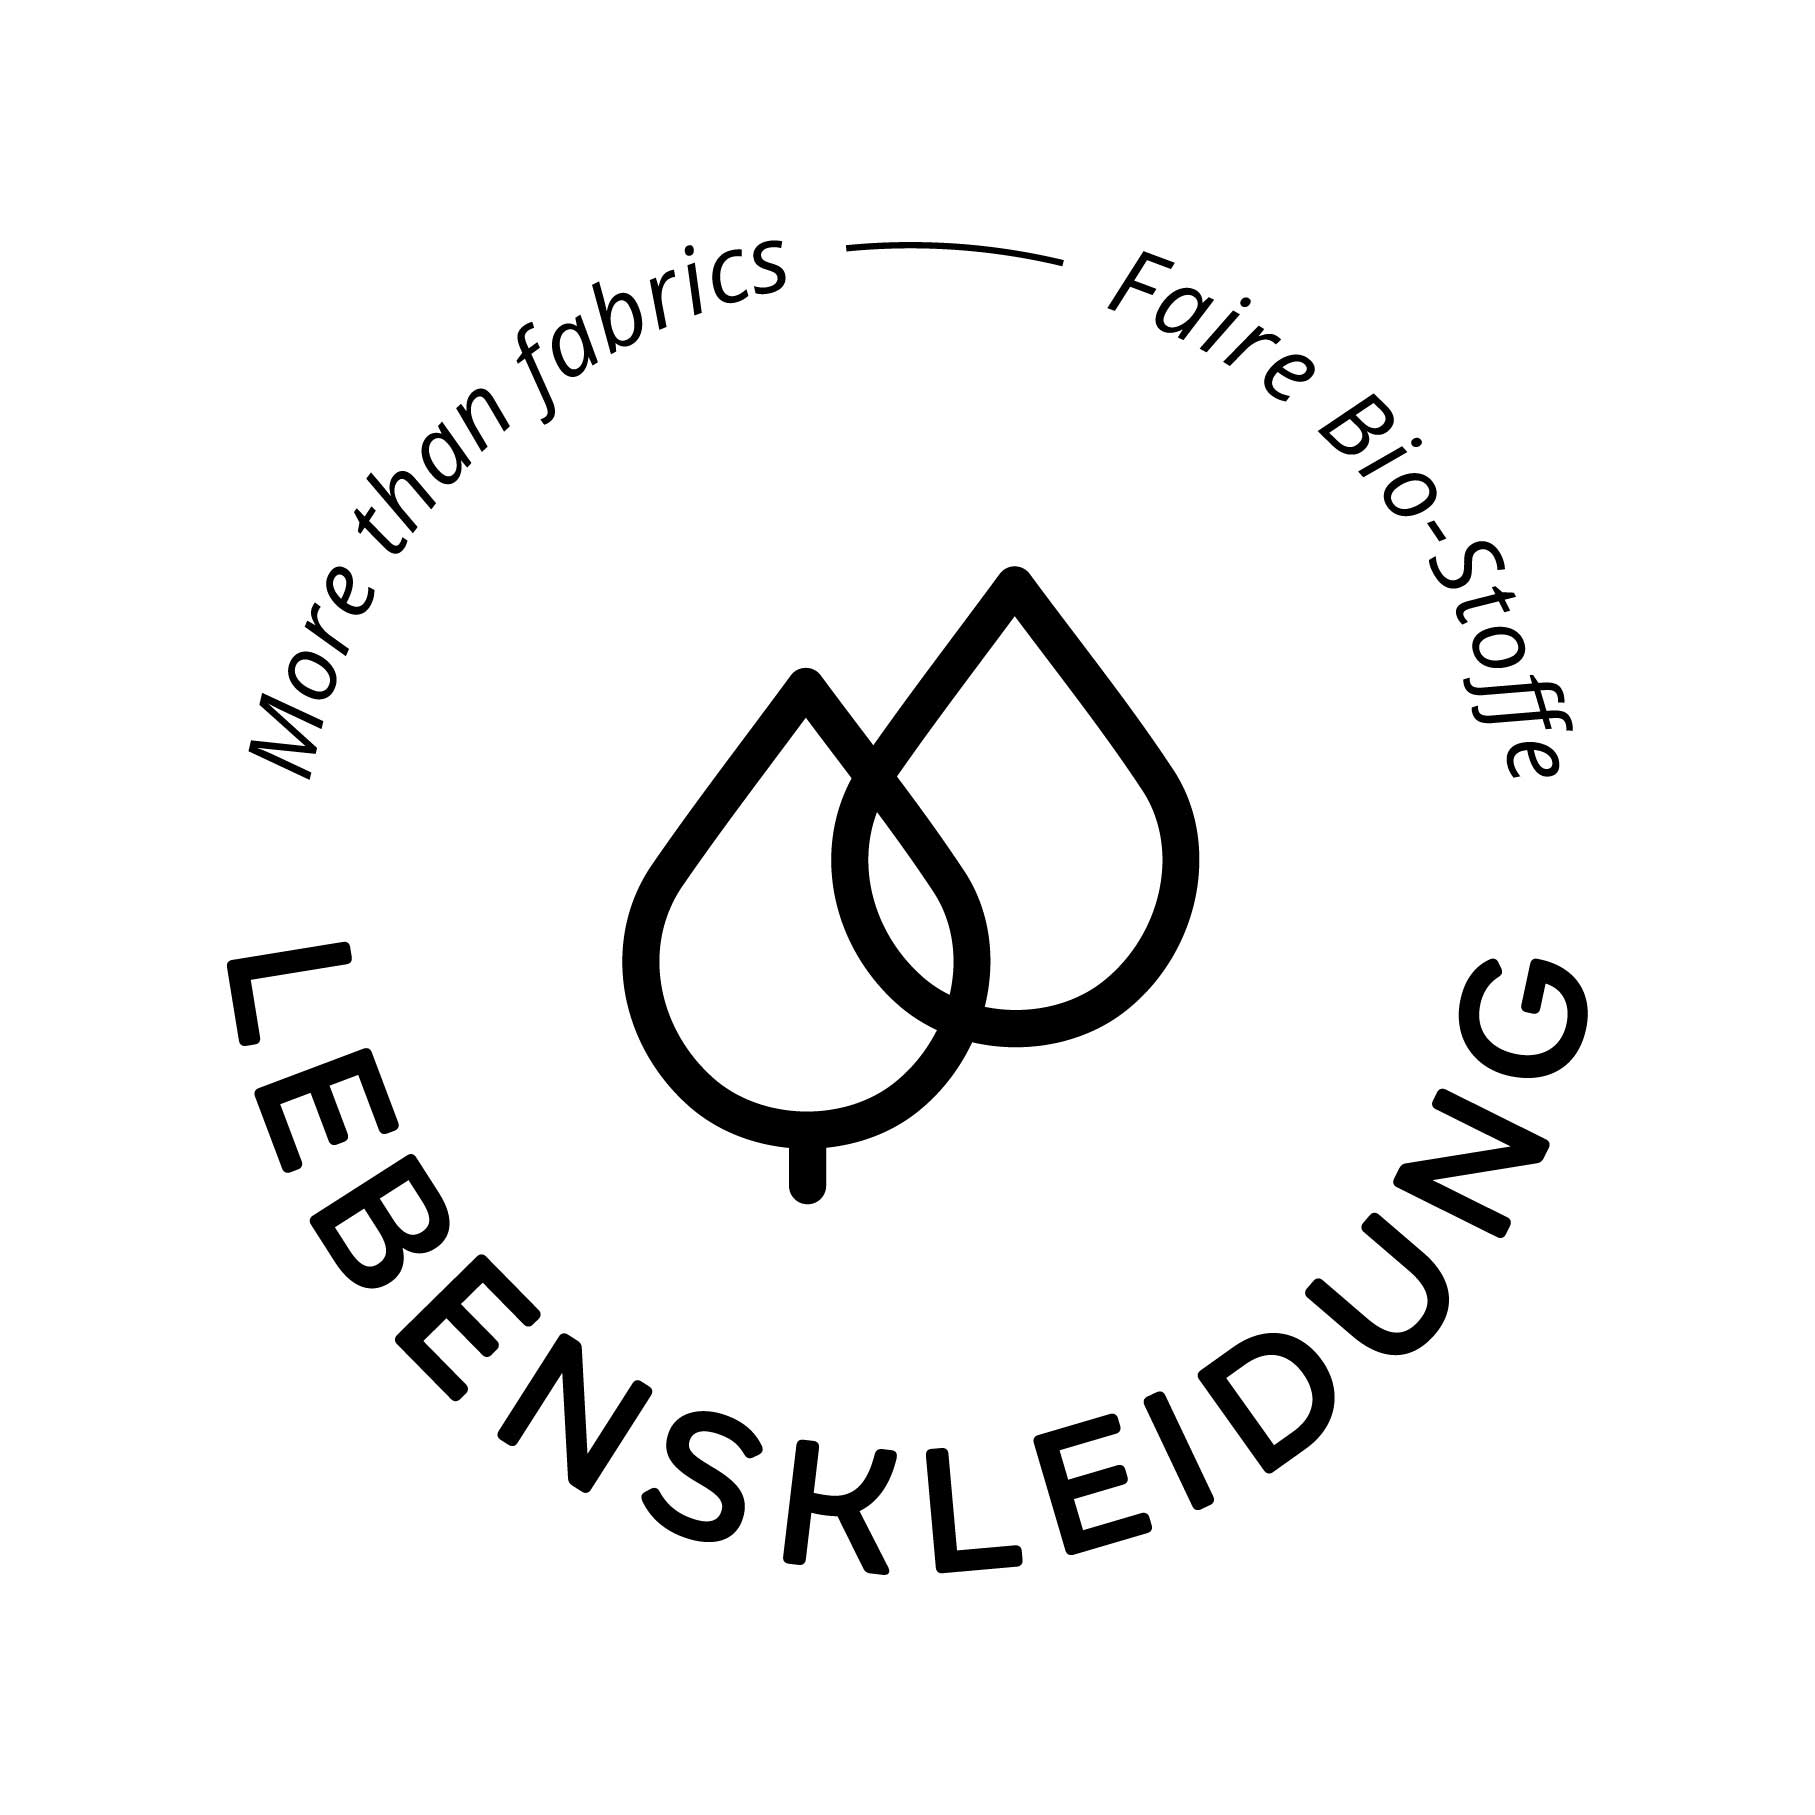 Organic RIB 2x1 (Cuff fabric) - Black-1